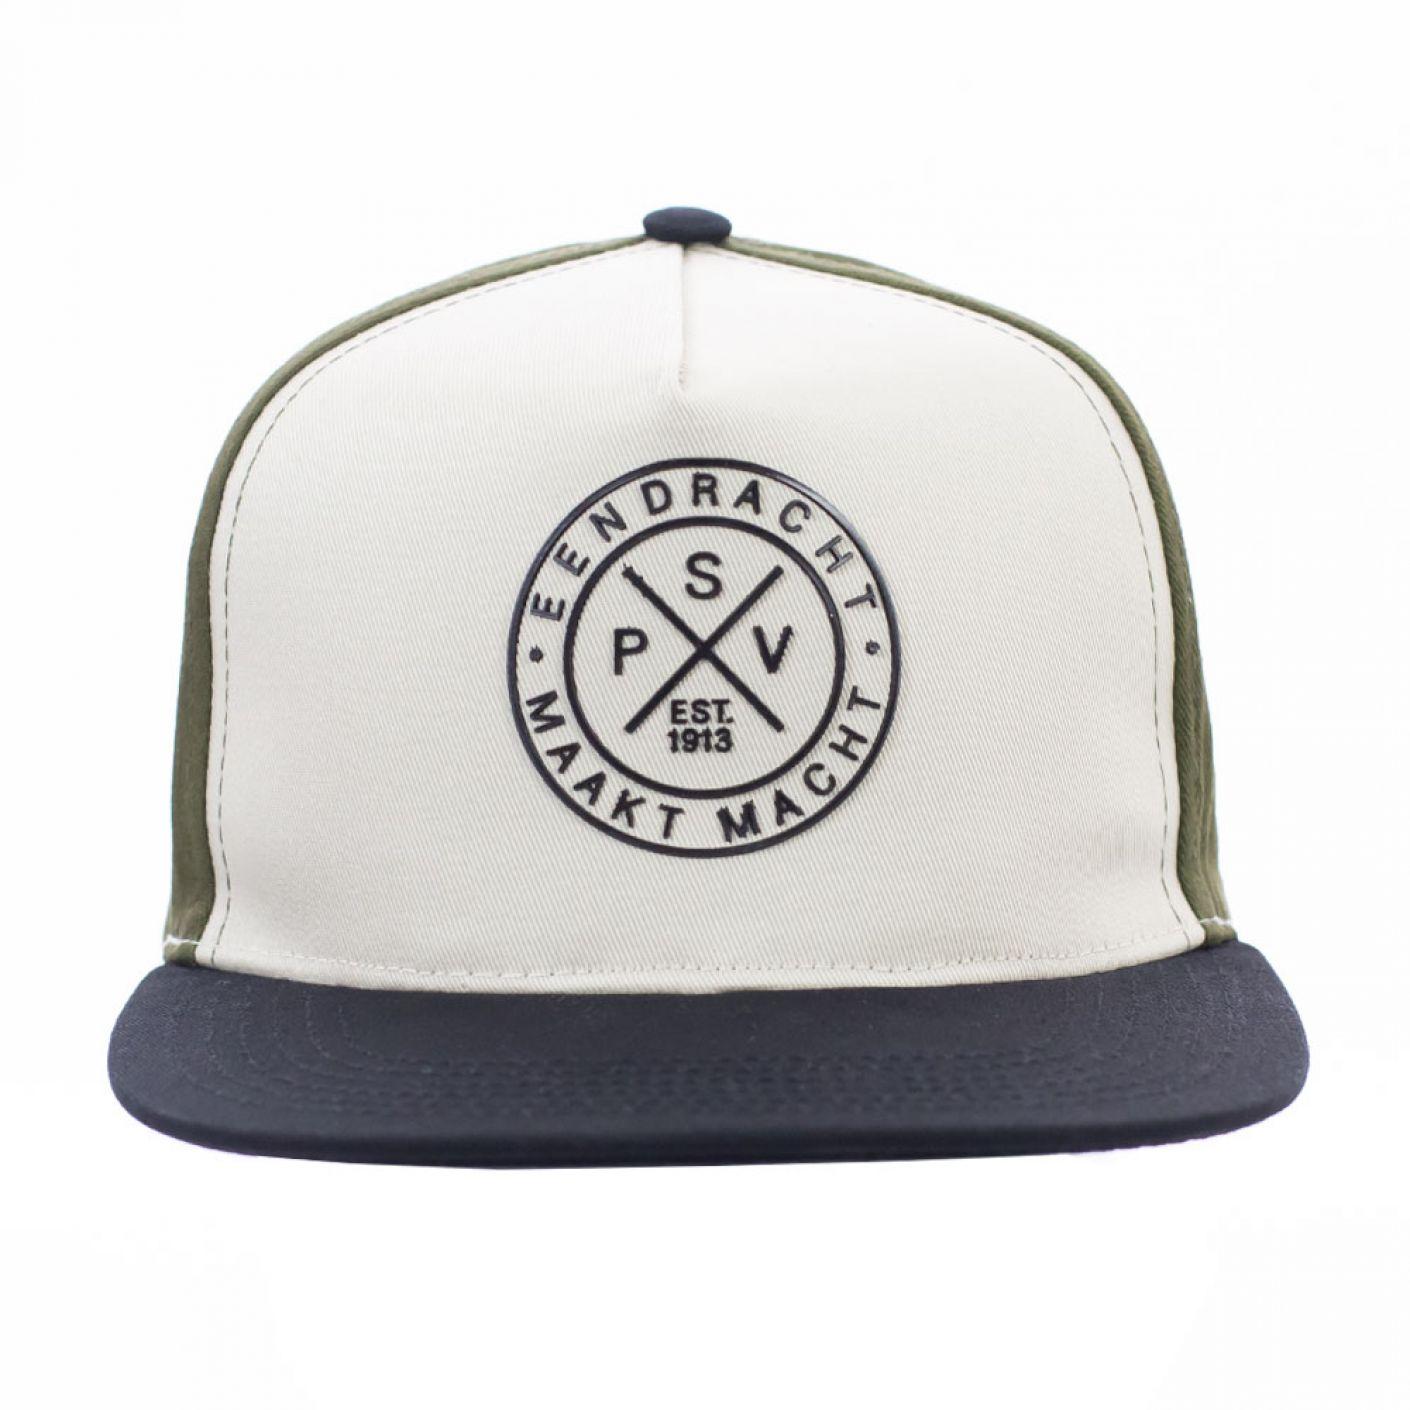 PSV Cap Flatpeak EMM Cross khaki JR